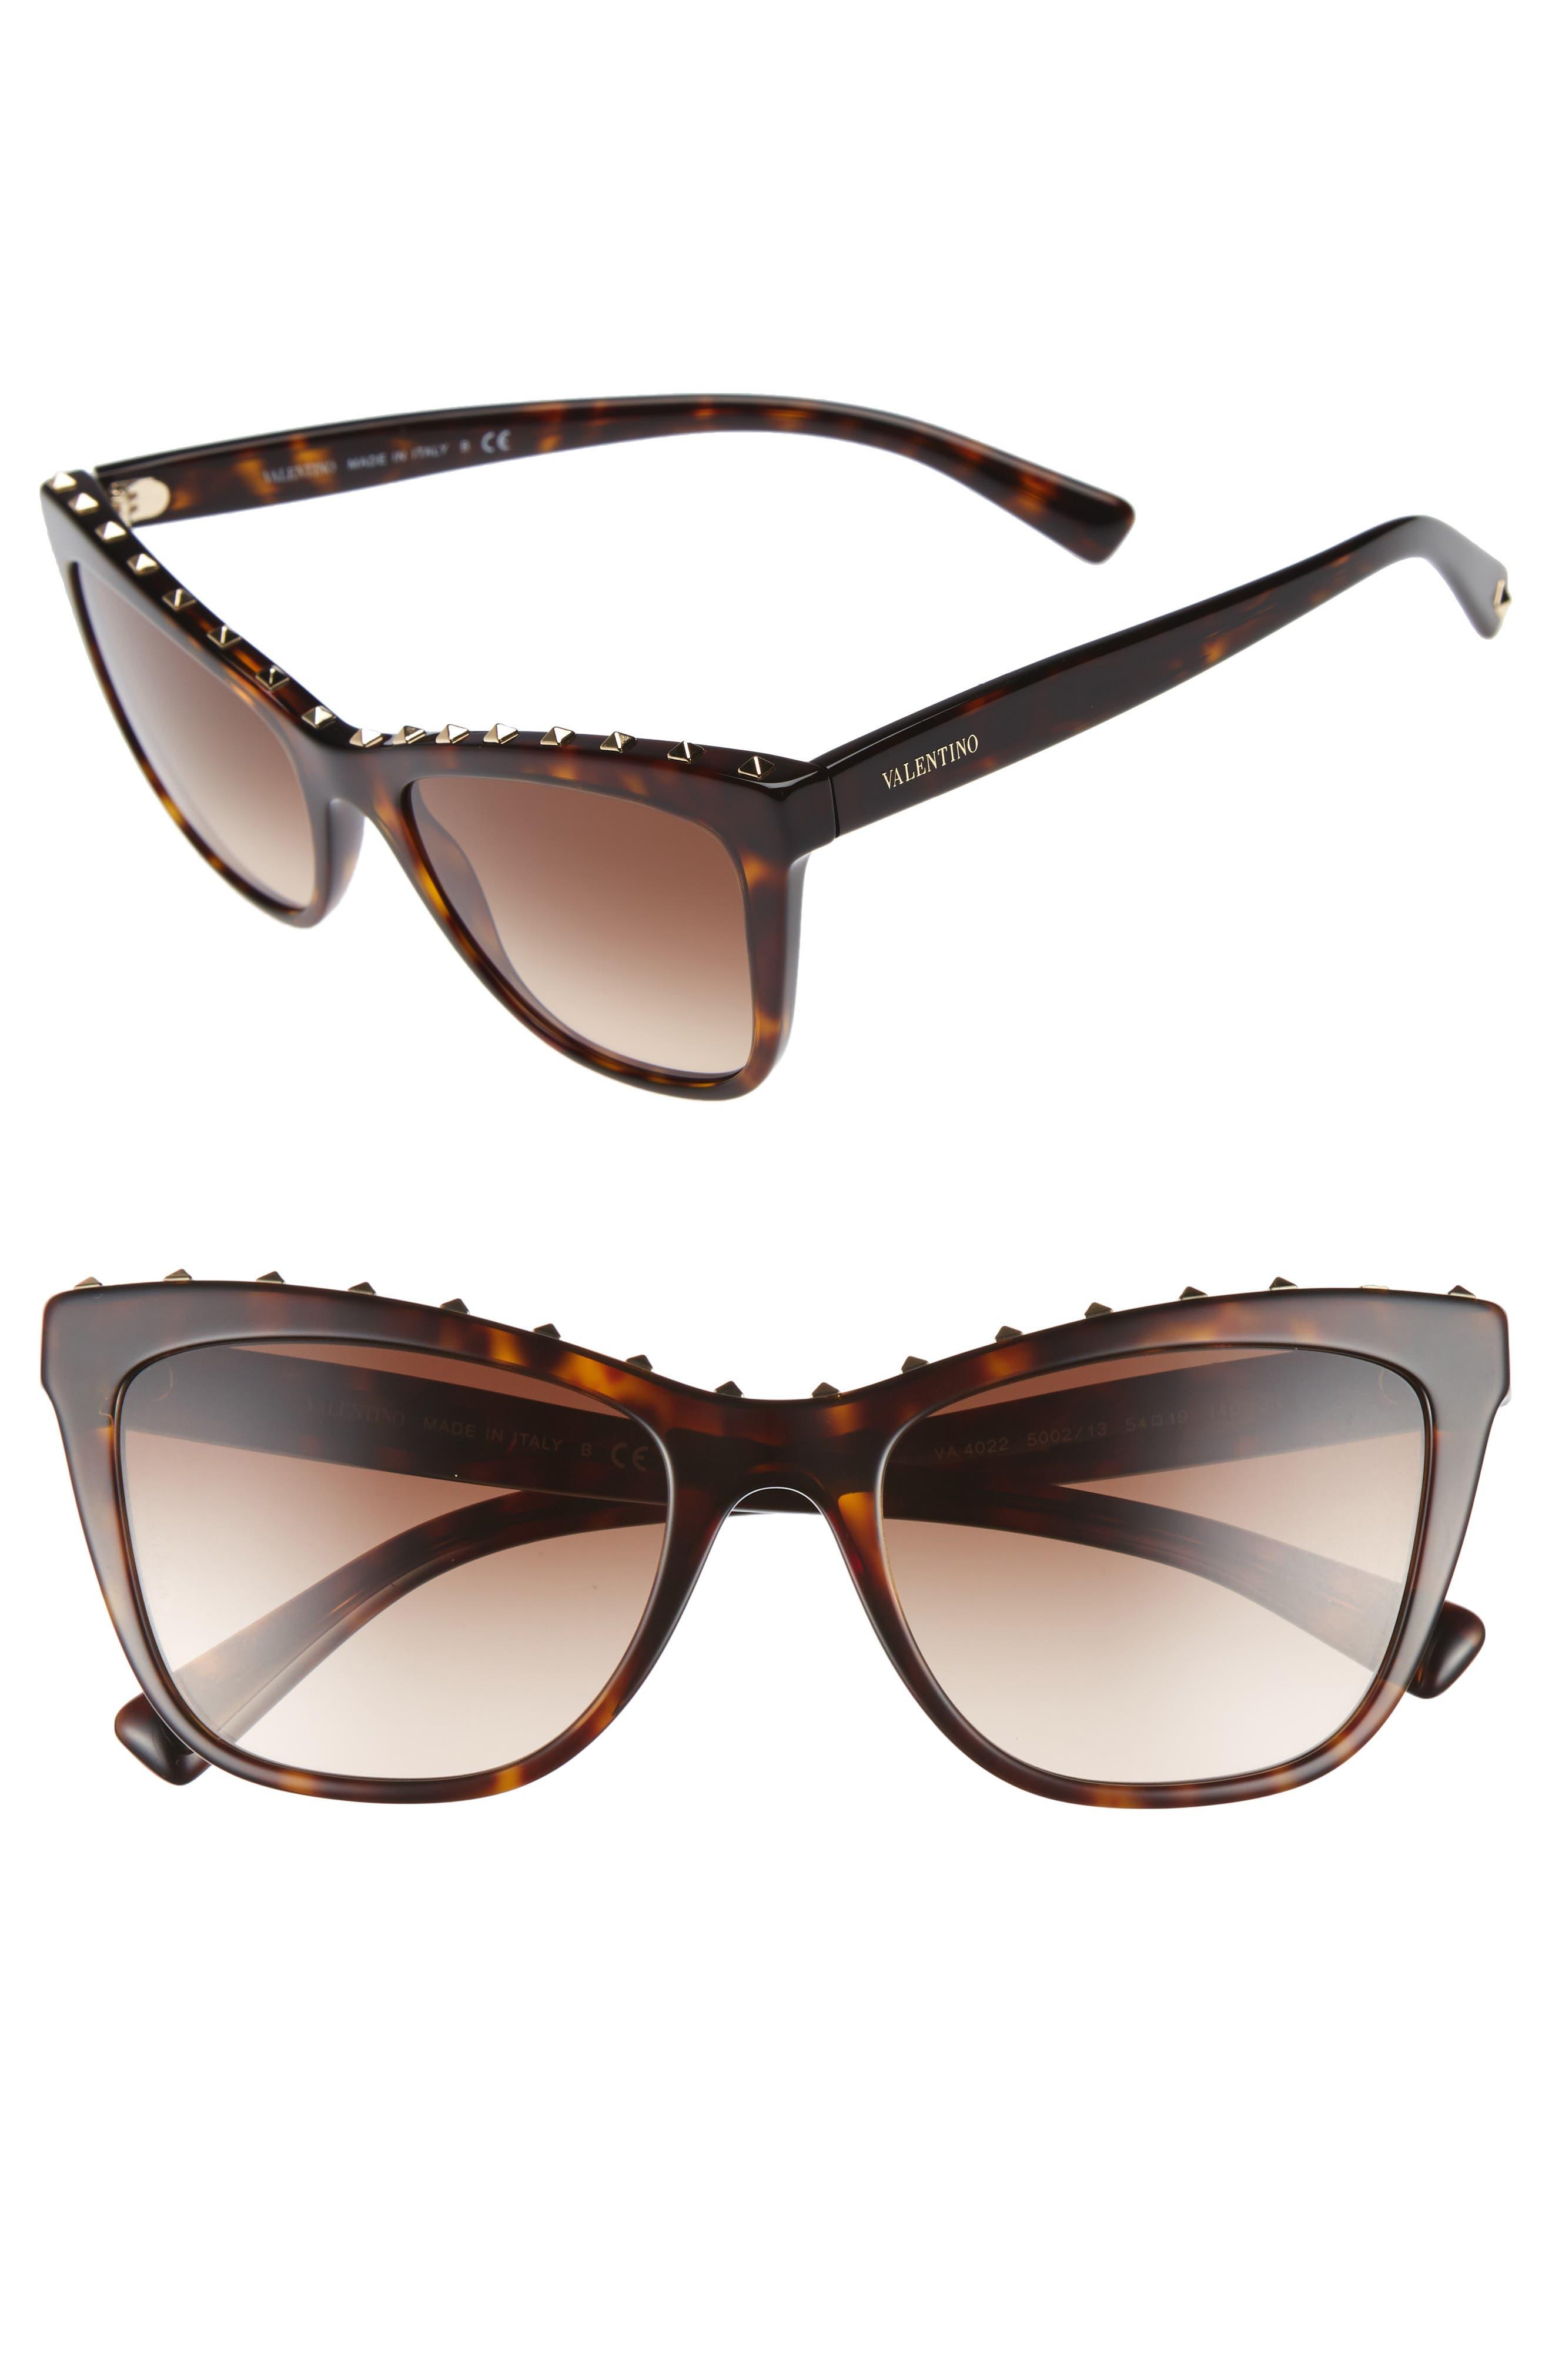 Main Image - Valentino Rockstud 54mm Cat Eye Sunglasses